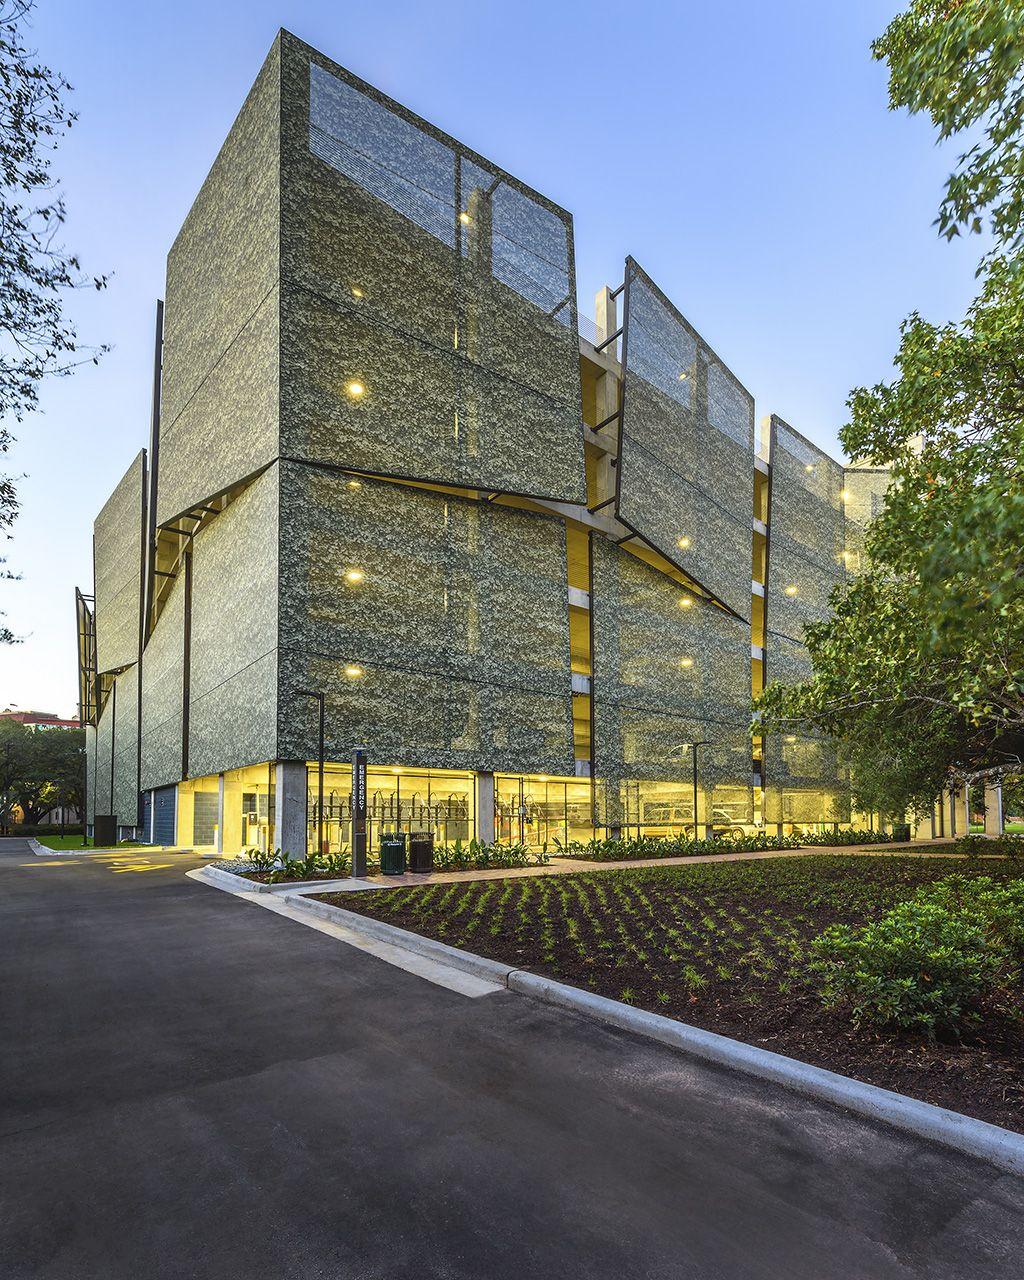 Rice University Parking Garage Facade Architecture Parking Building Architecture